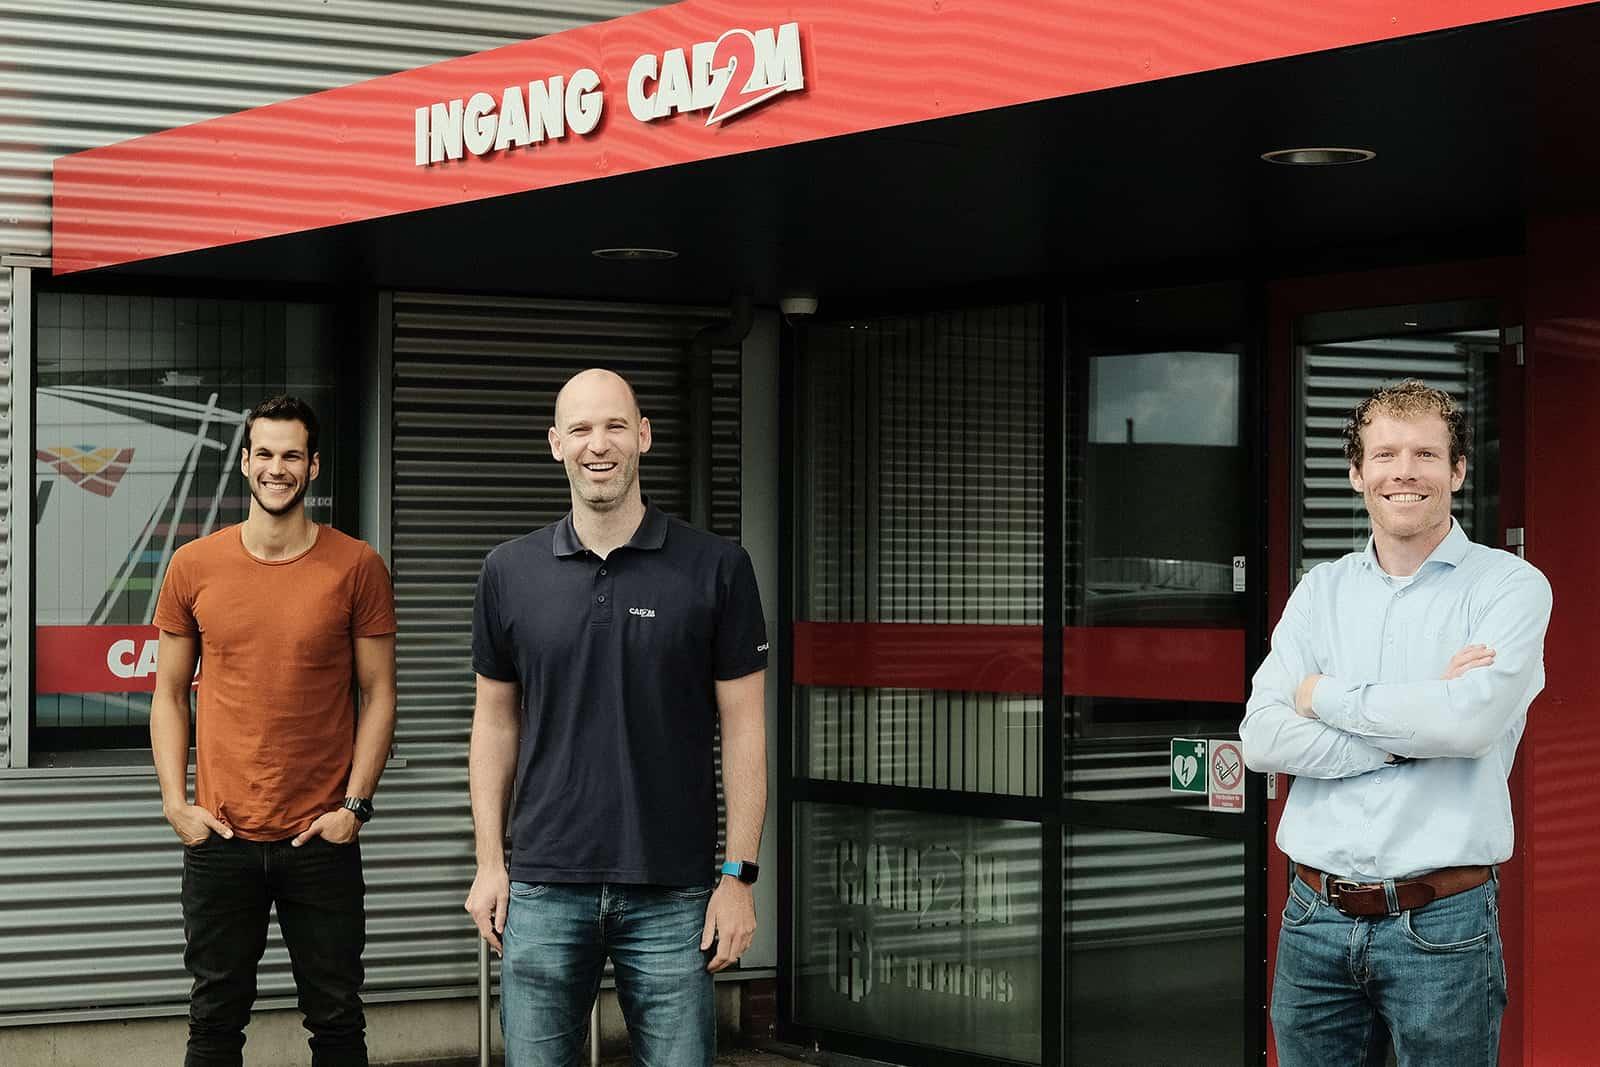 Shalev, Michel en Bram (vlnr) bij CAD2M